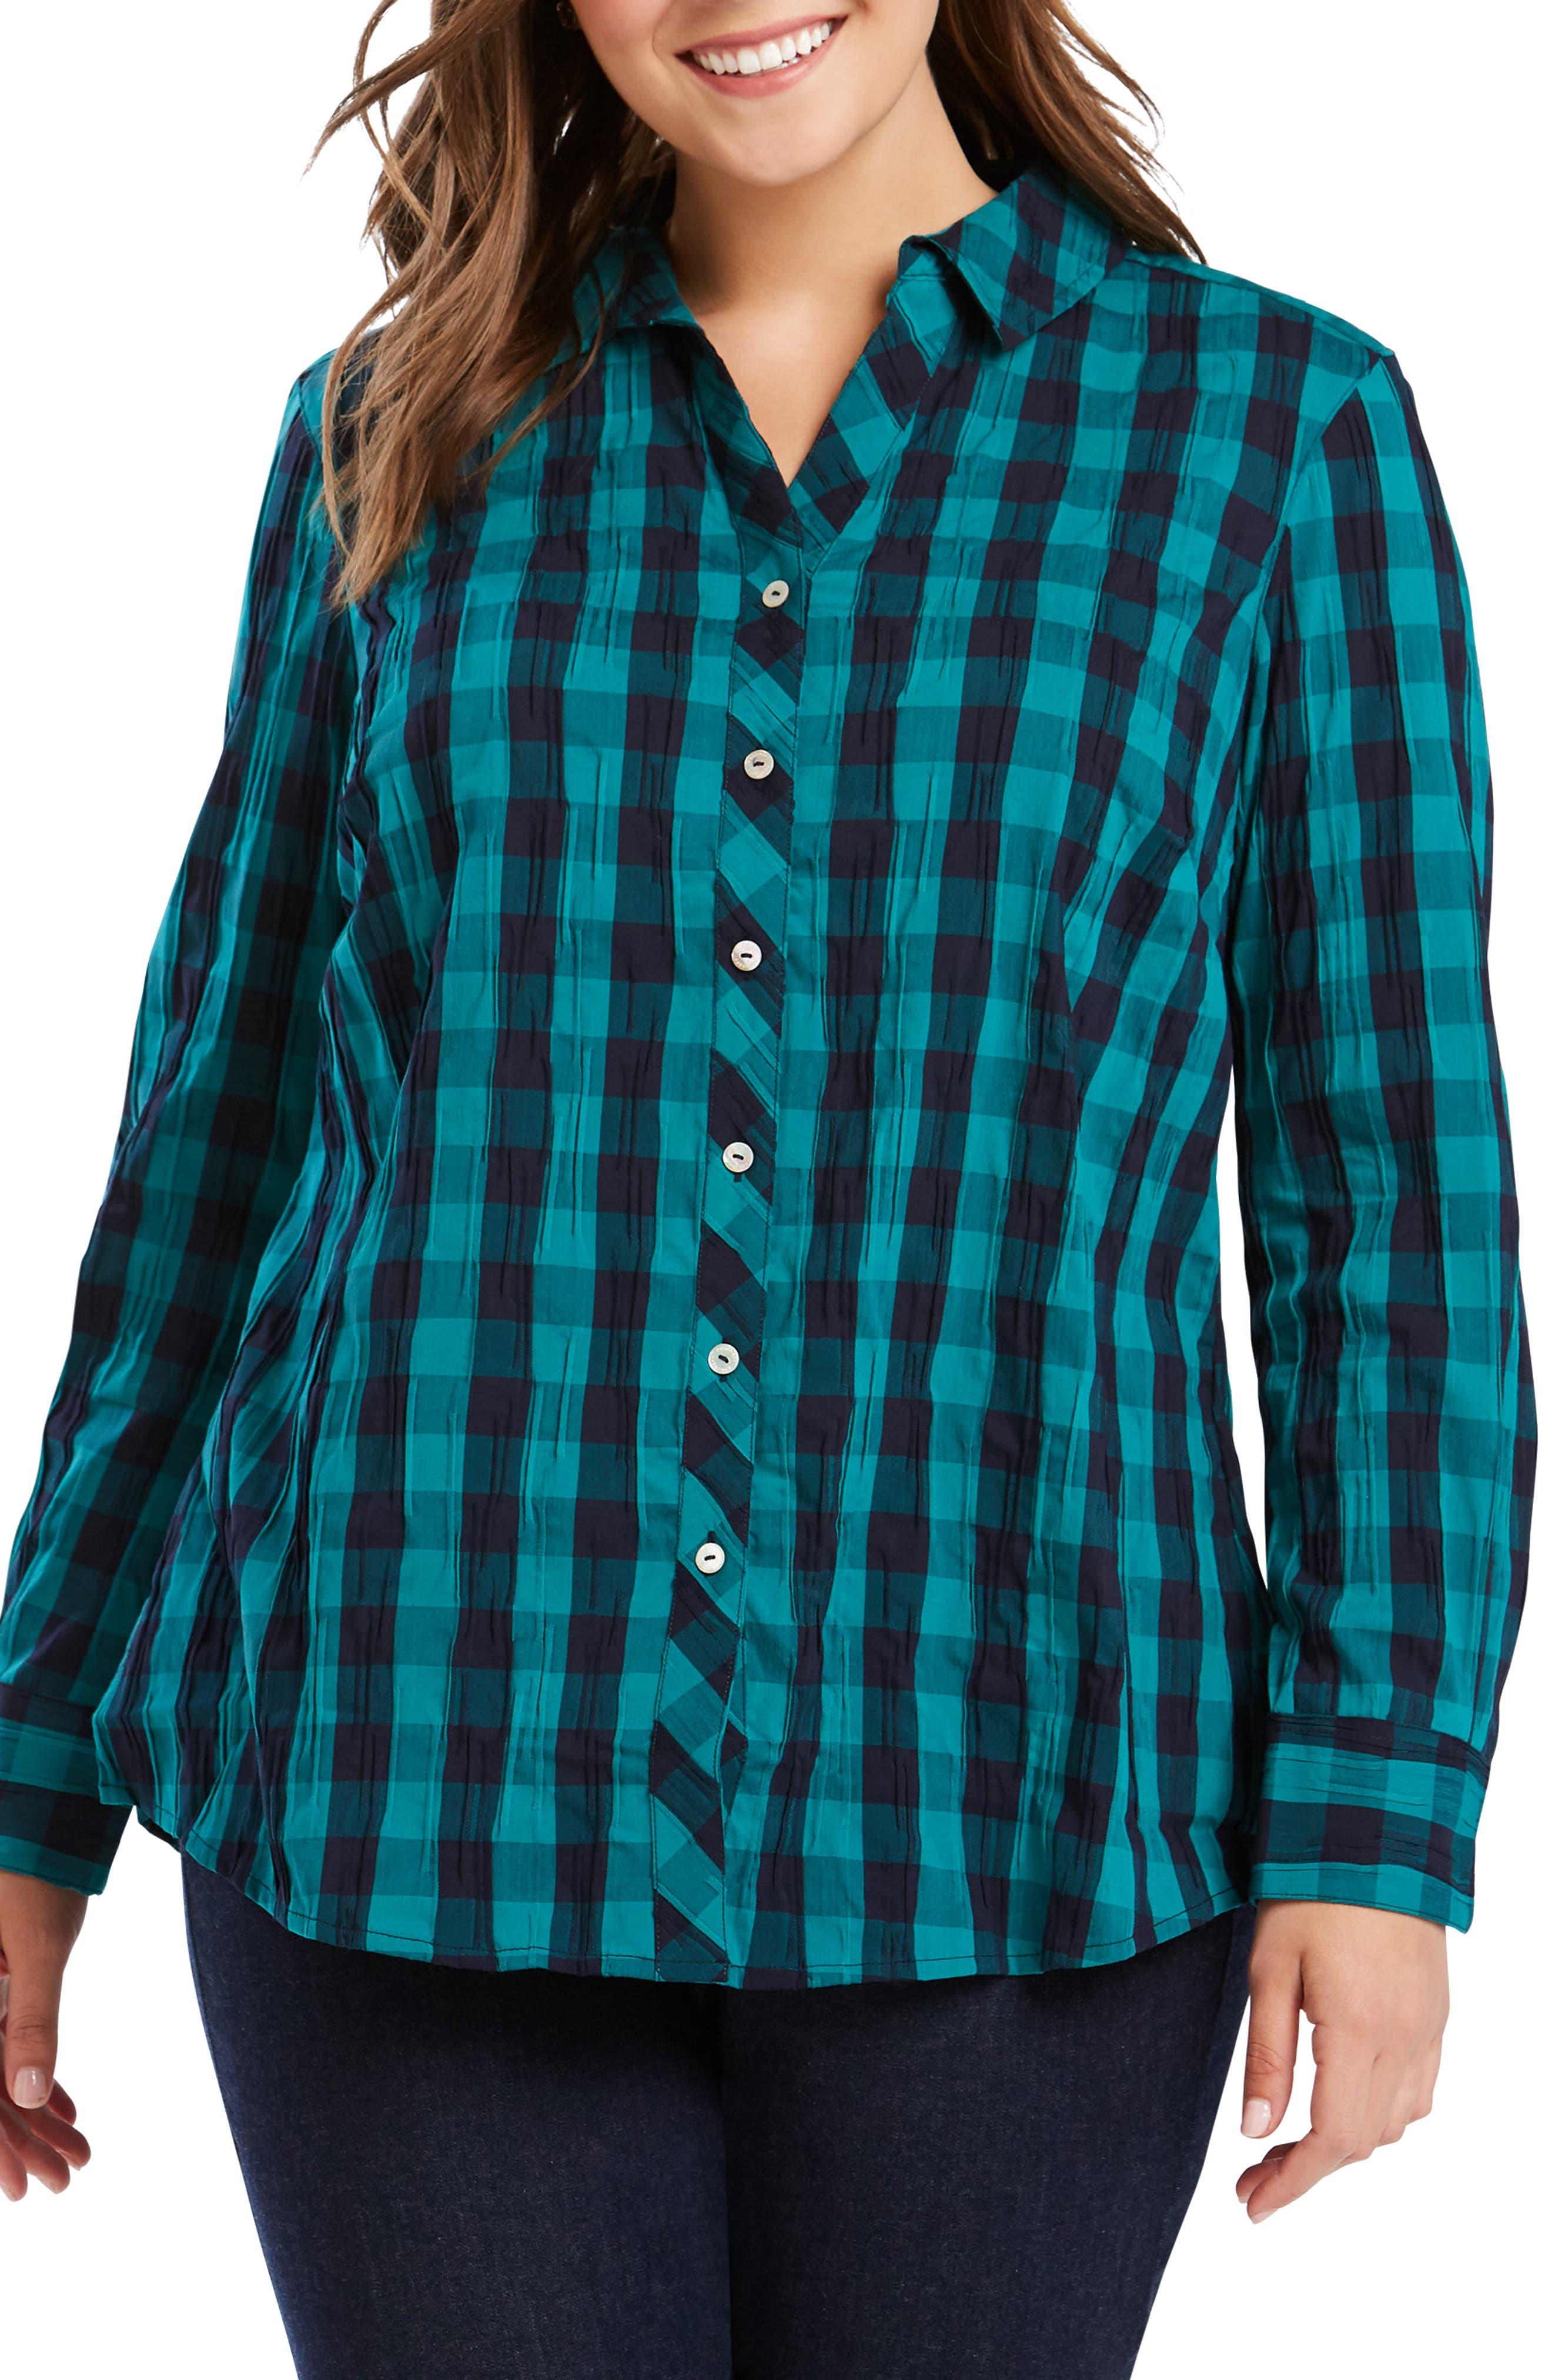 Mary Buffalo Check Crinkle Shirt,                             Main thumbnail 1, color,                             EMERALD CUT